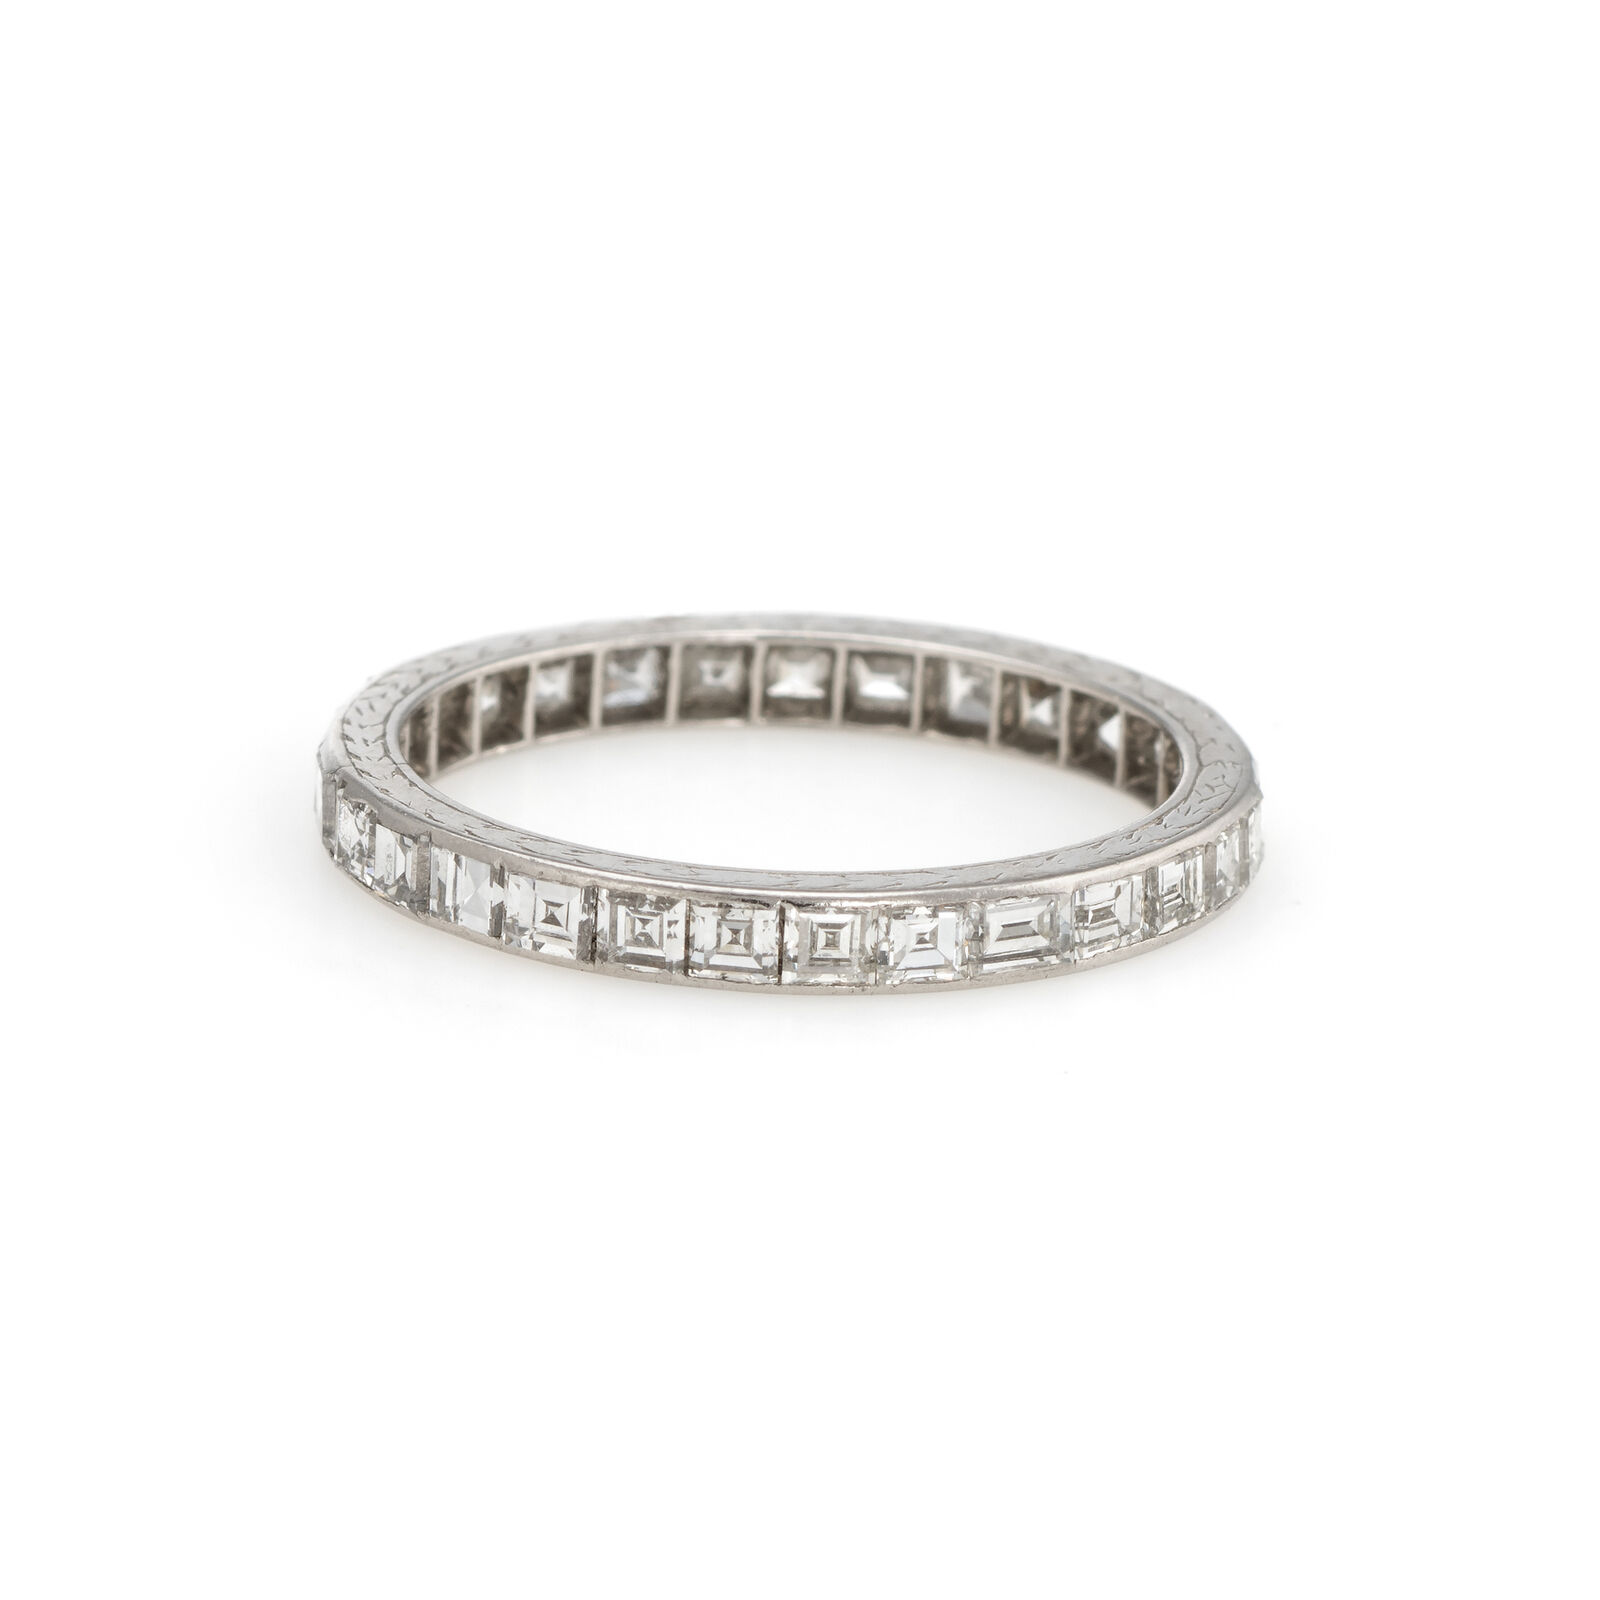 Antique Deco Carre Diamond Eternity Ring Platinum Sz 5.75 Vintage Fine Jewelry